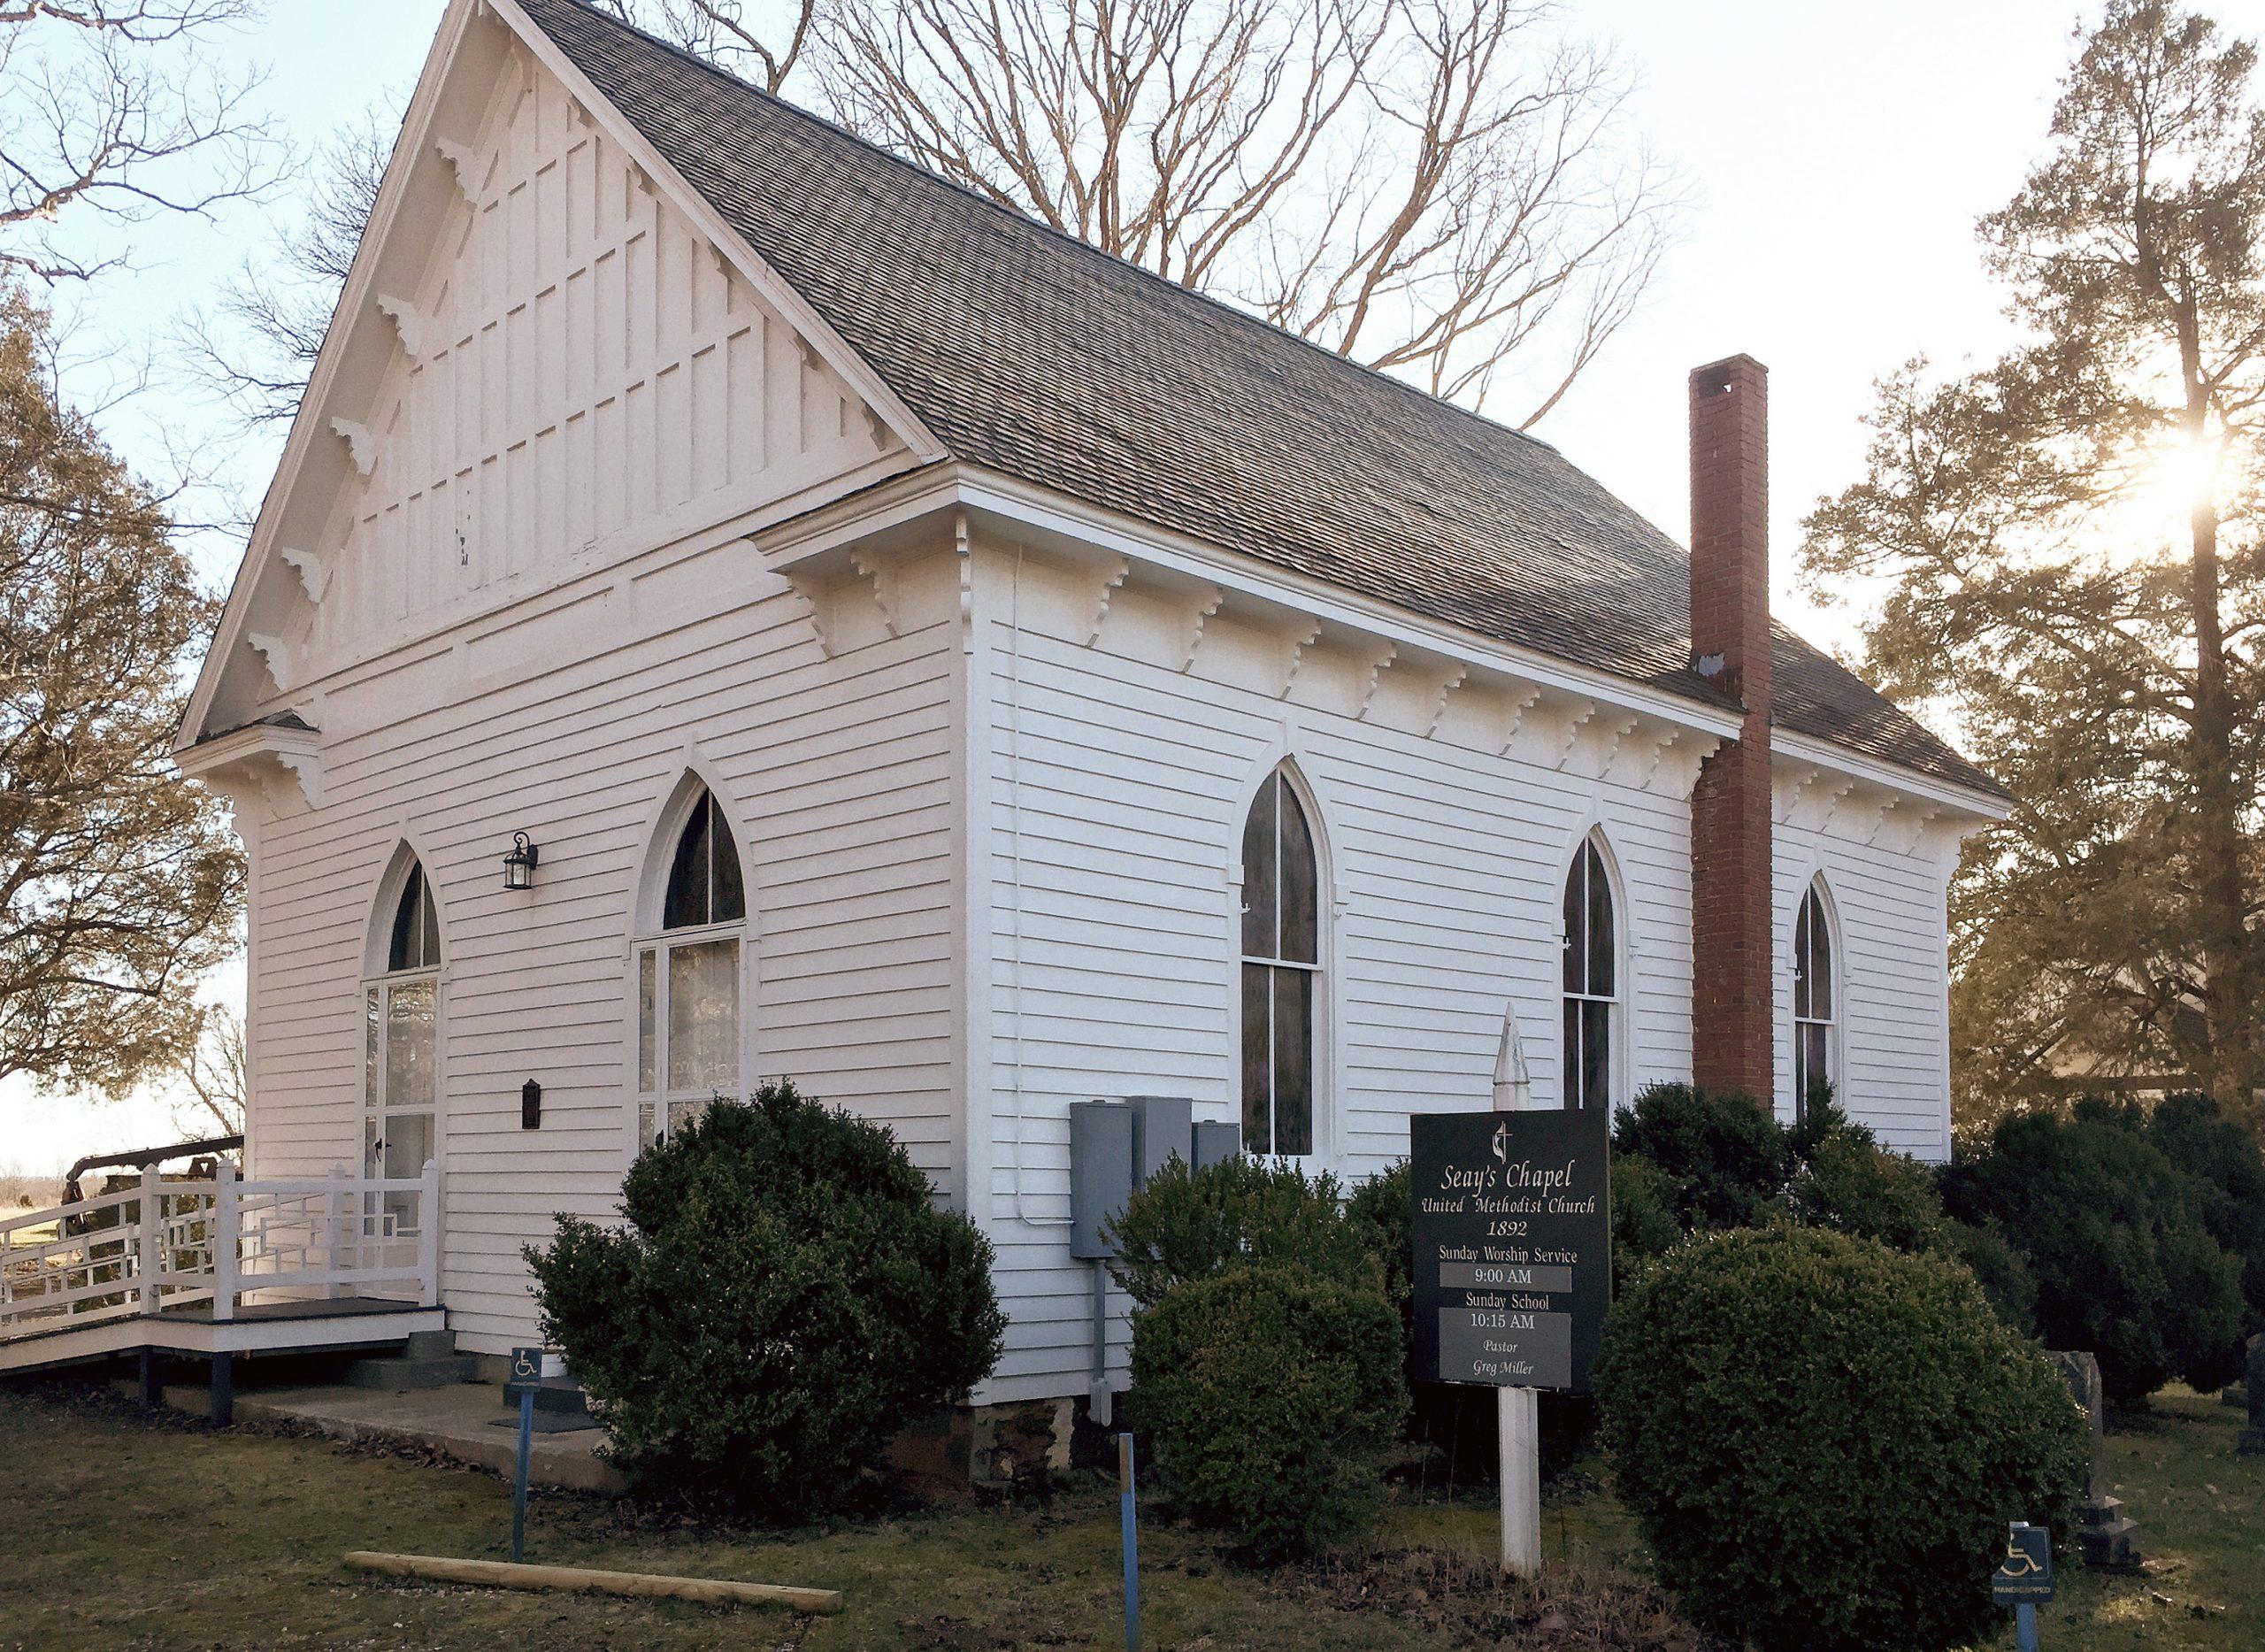 Seay's Chapel Methodist Church